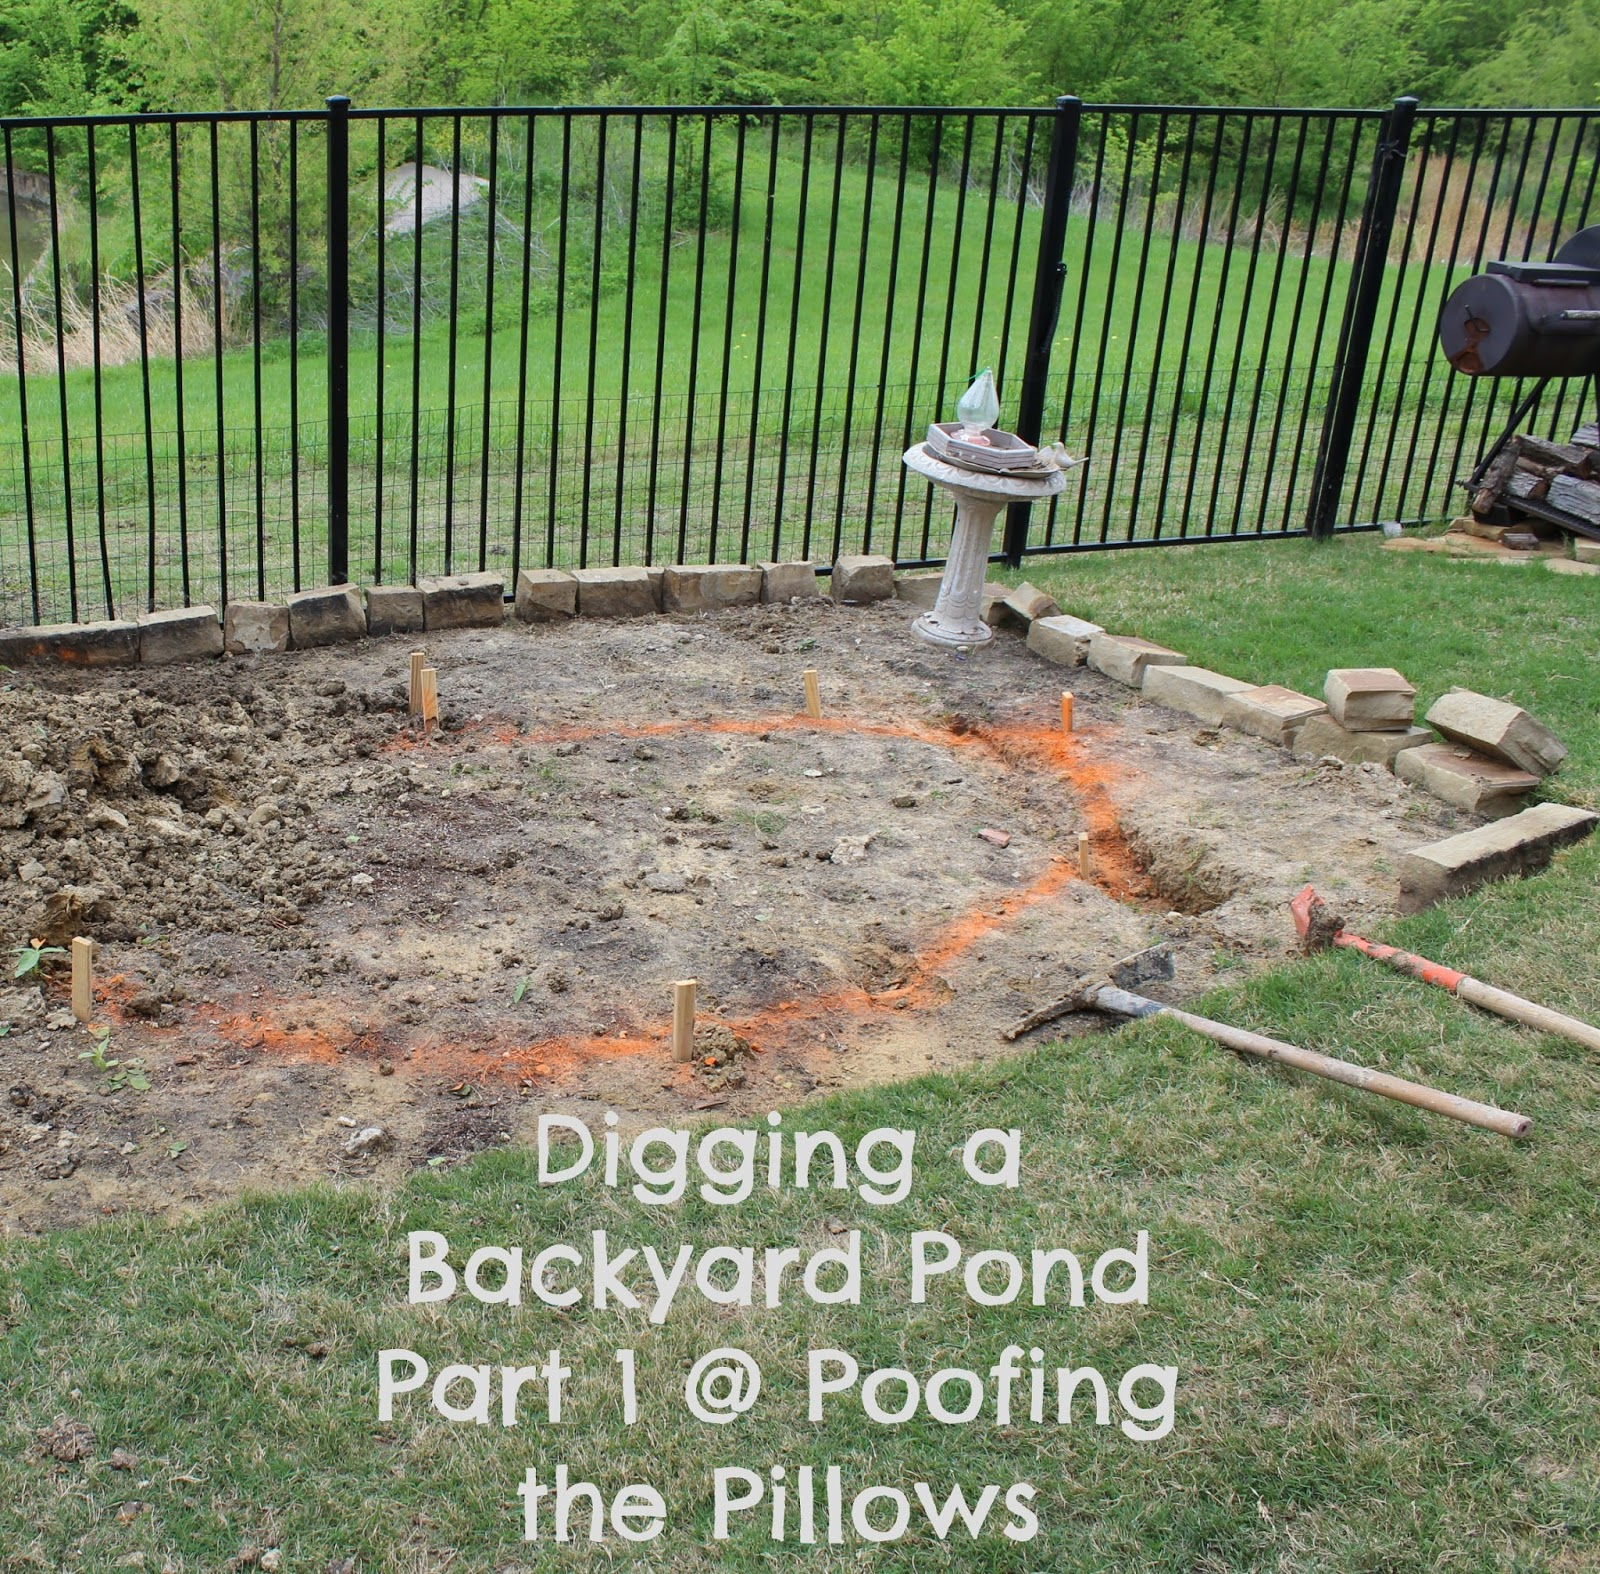 Building a Backyard Pond Part 2